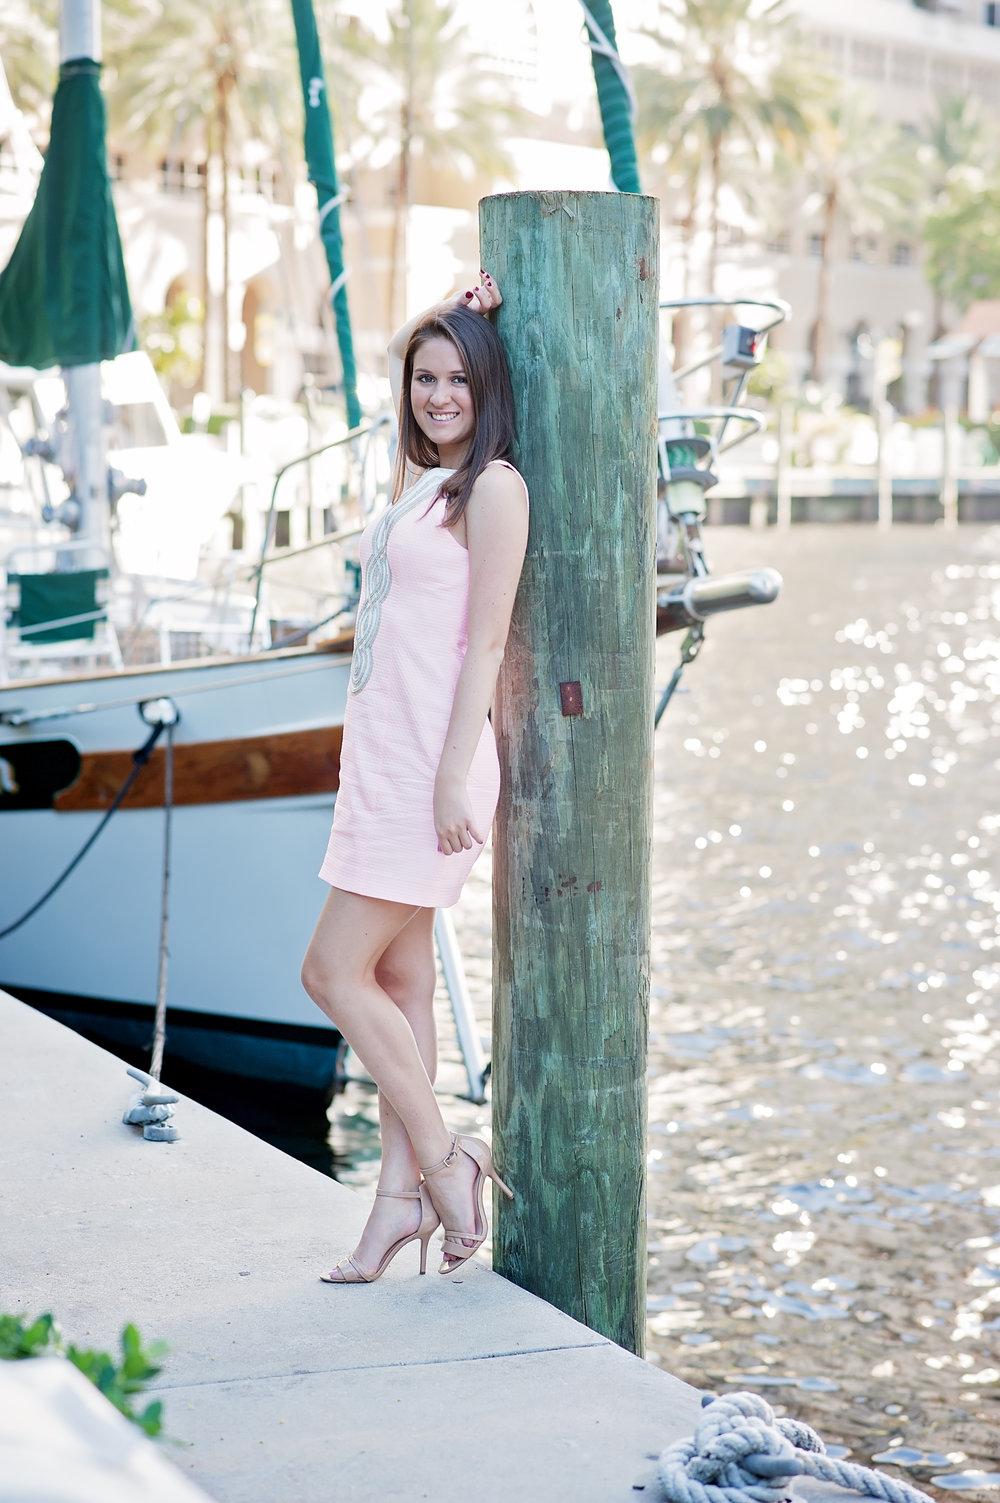 South Florida-photography-professional photographer-photography website-local photographer-teens-high school senior-photos-portrait photographer-149.jpg